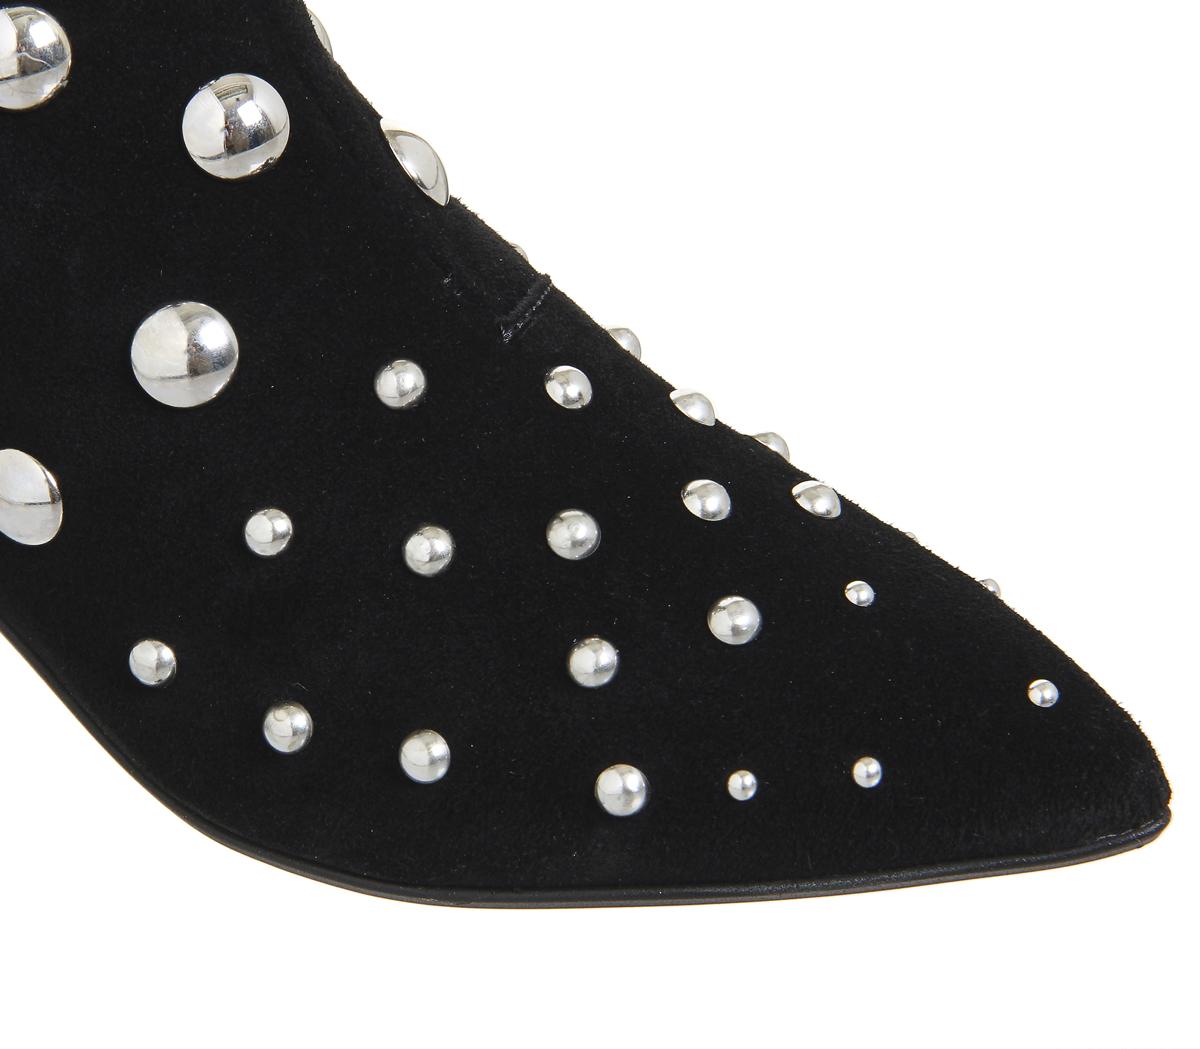 Damenschuhe Office Aruba SILVER Pointed Block Heel Stiefel BLACK SUEDE SILVER Aruba HARDWARE Stiefel 5280af